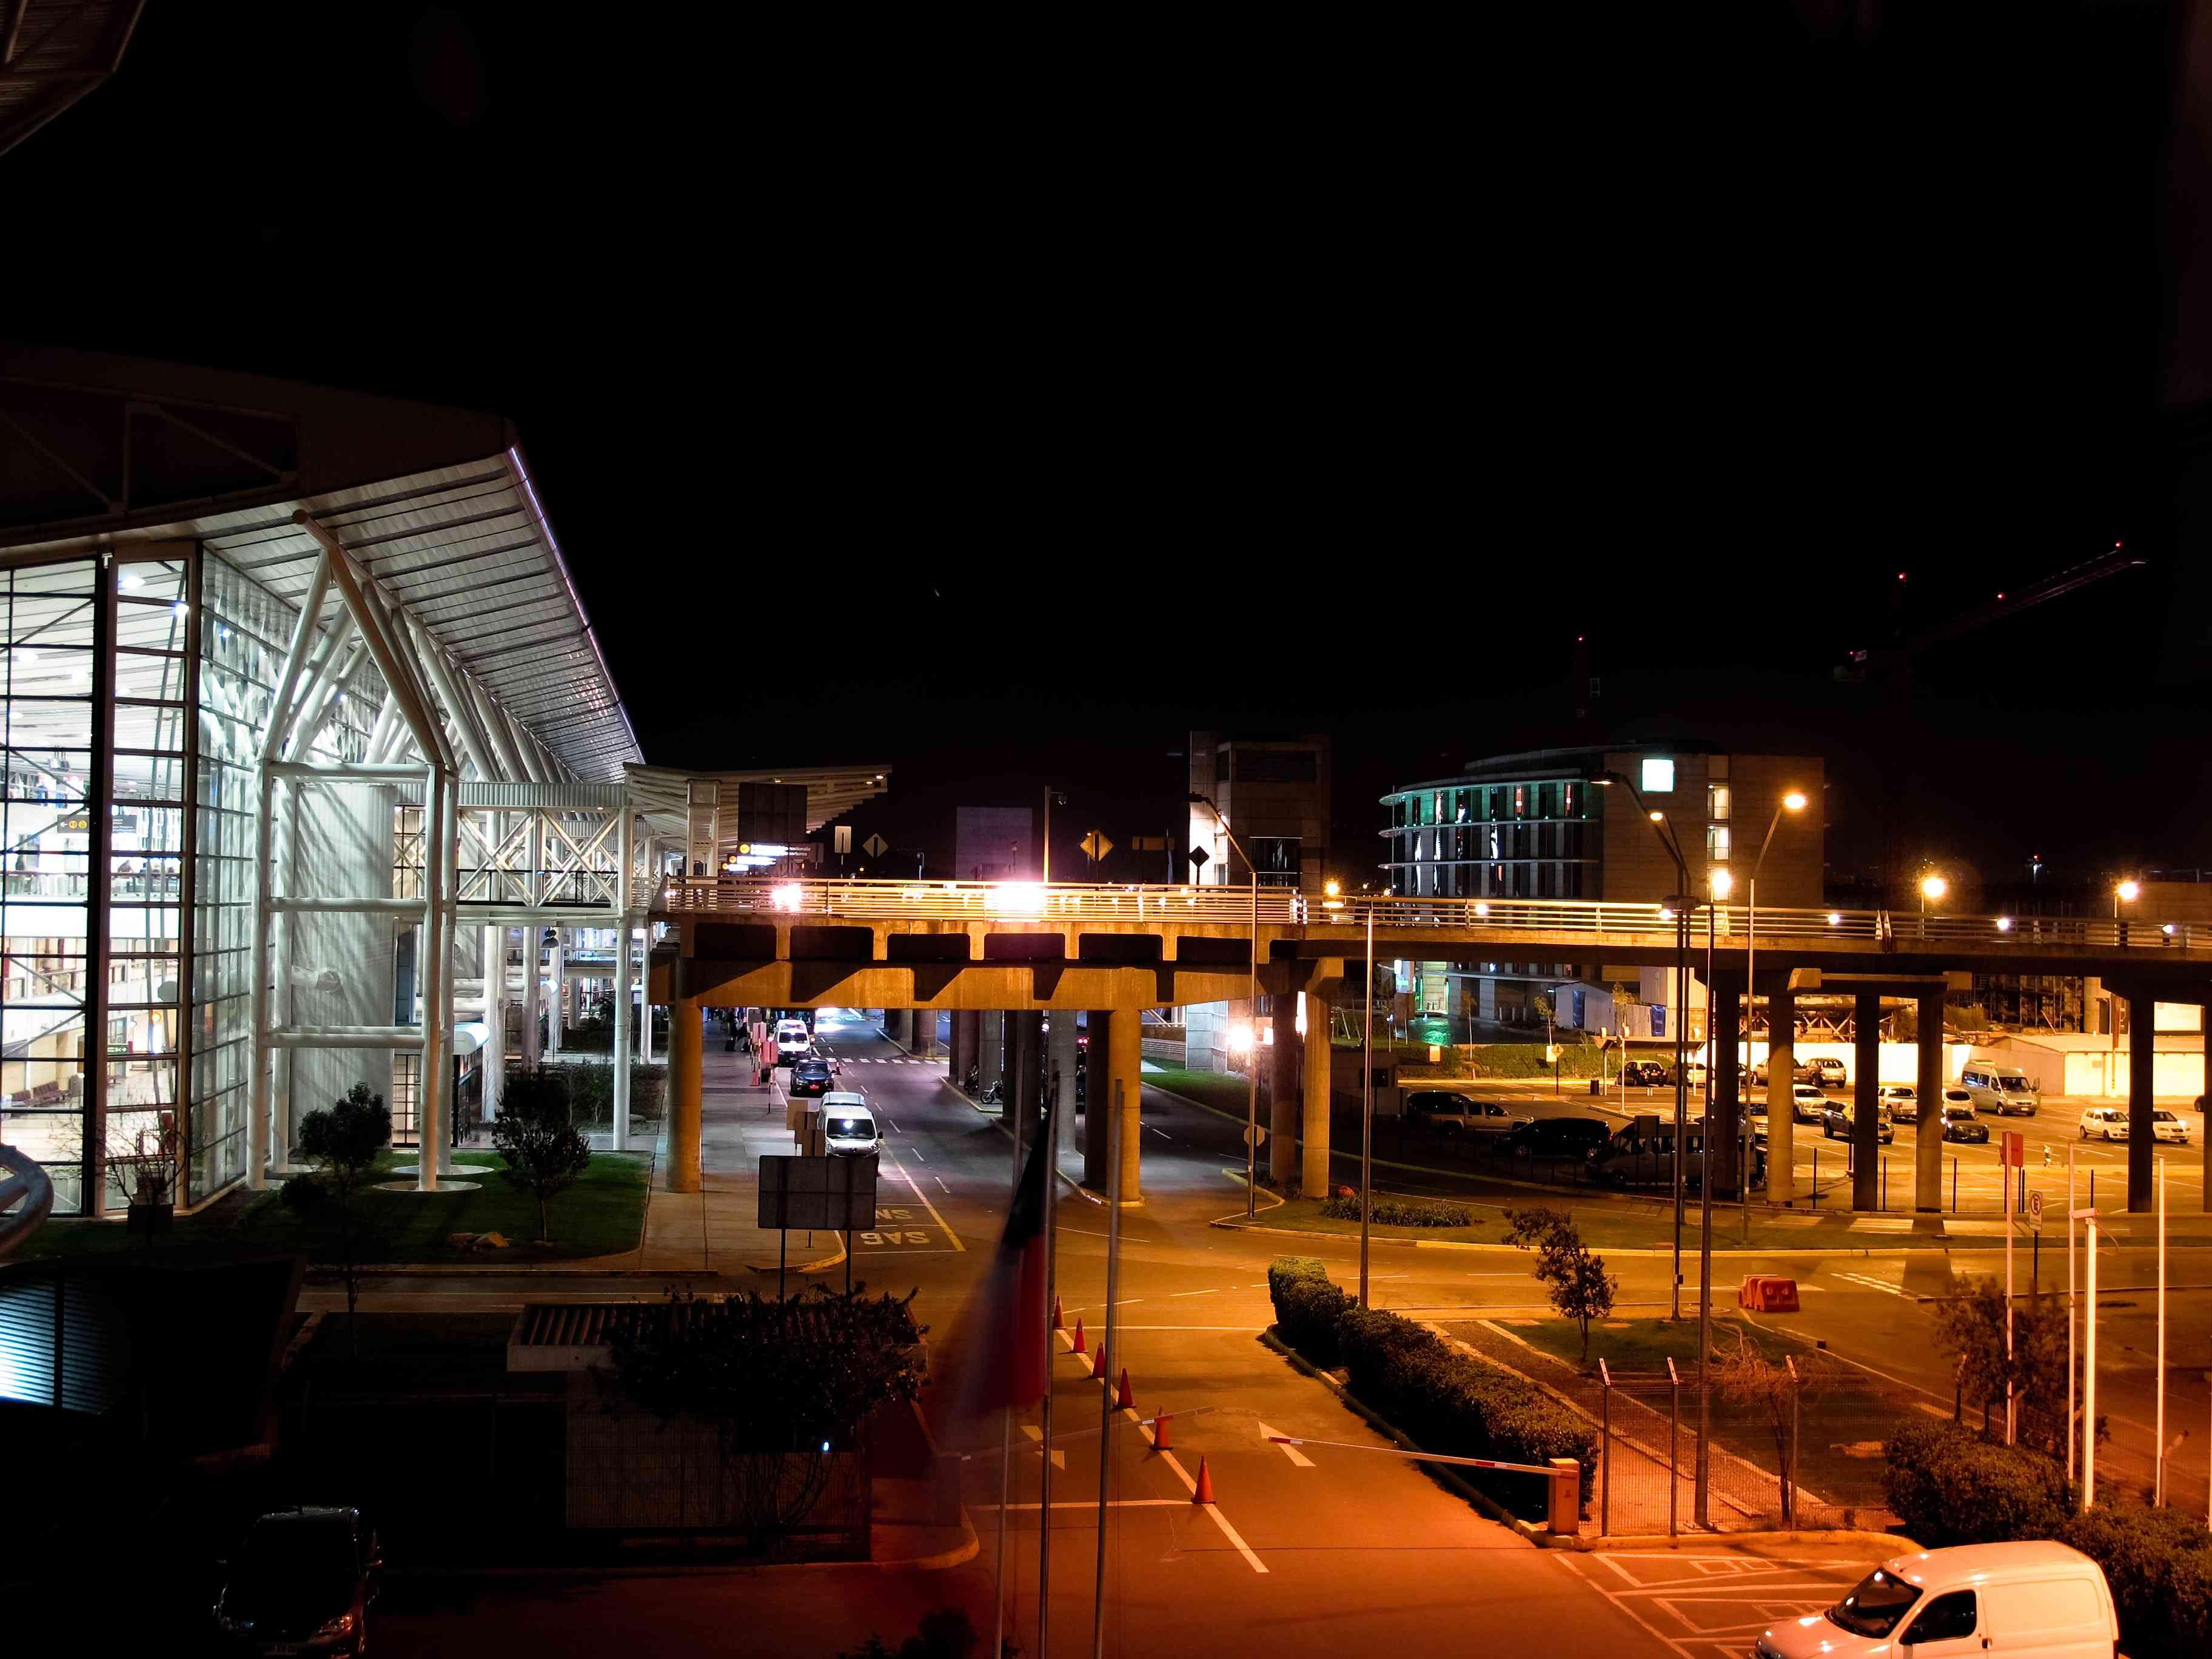 Santiago International Airport, Chile